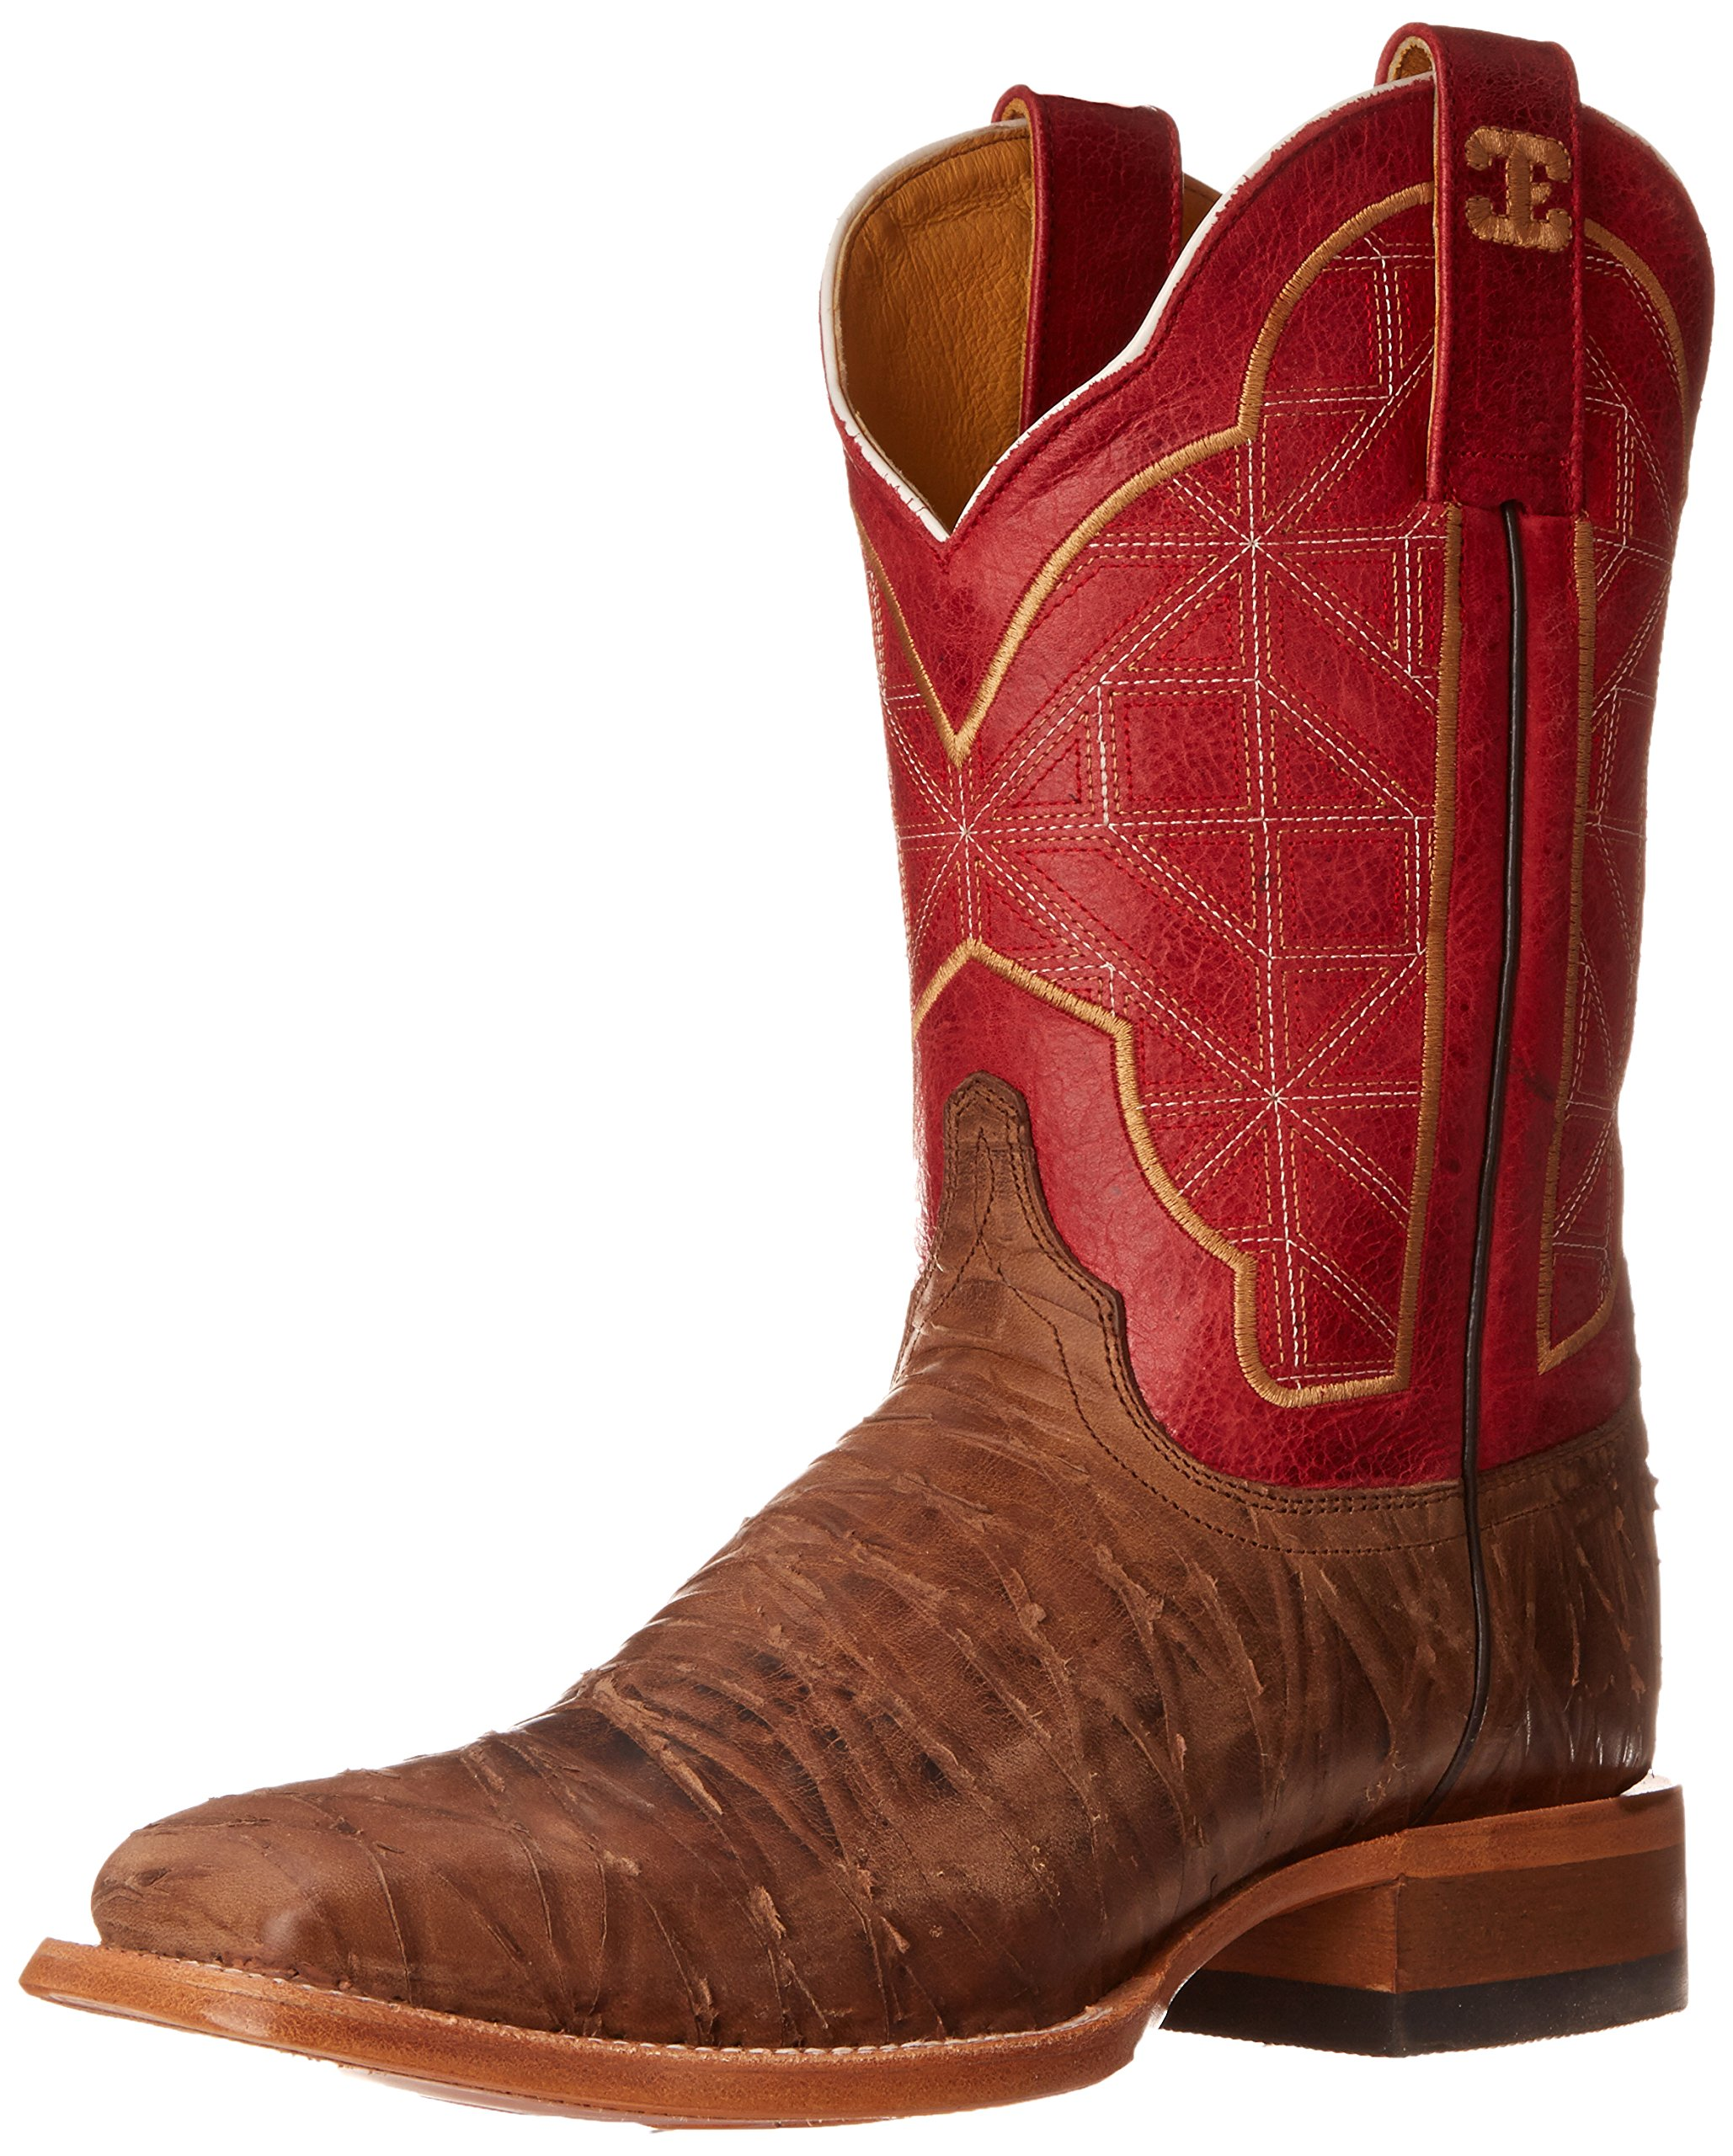 Cinch Men's Jordan MN Western Boot,Brown,11.5 D US by Cinch